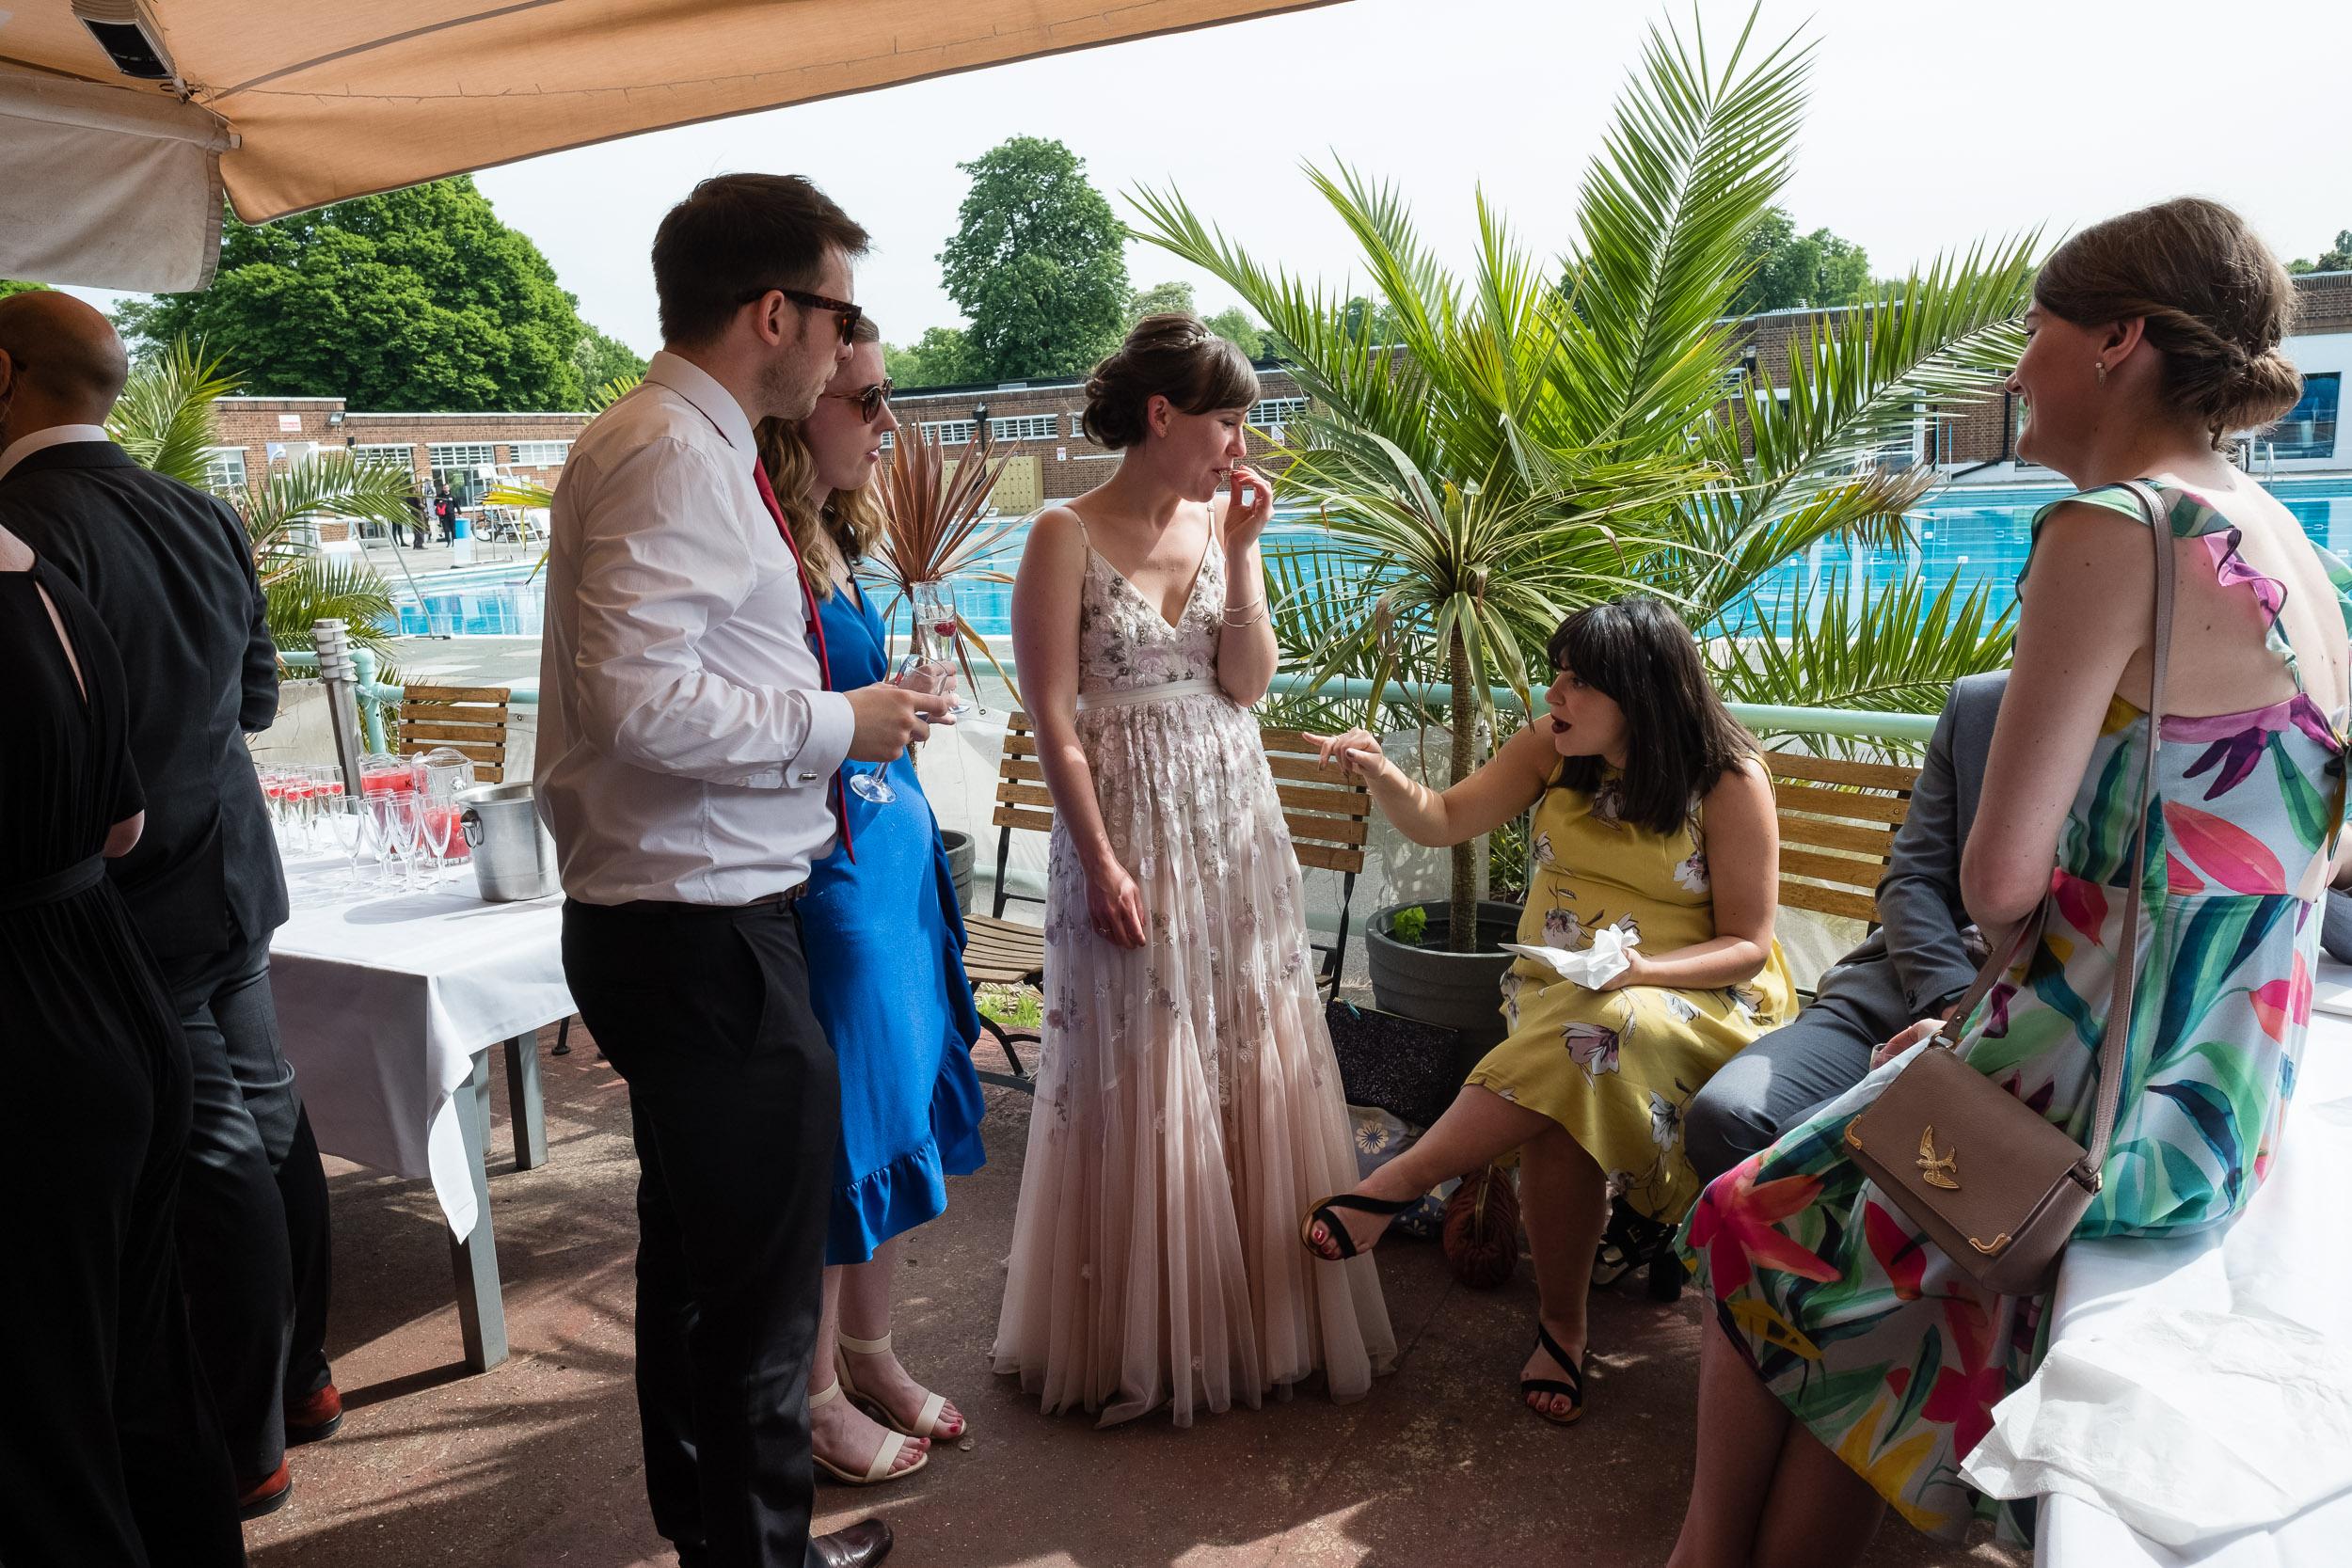 brockwell-lido-brixton-herne-hill-wedding-244.jpg